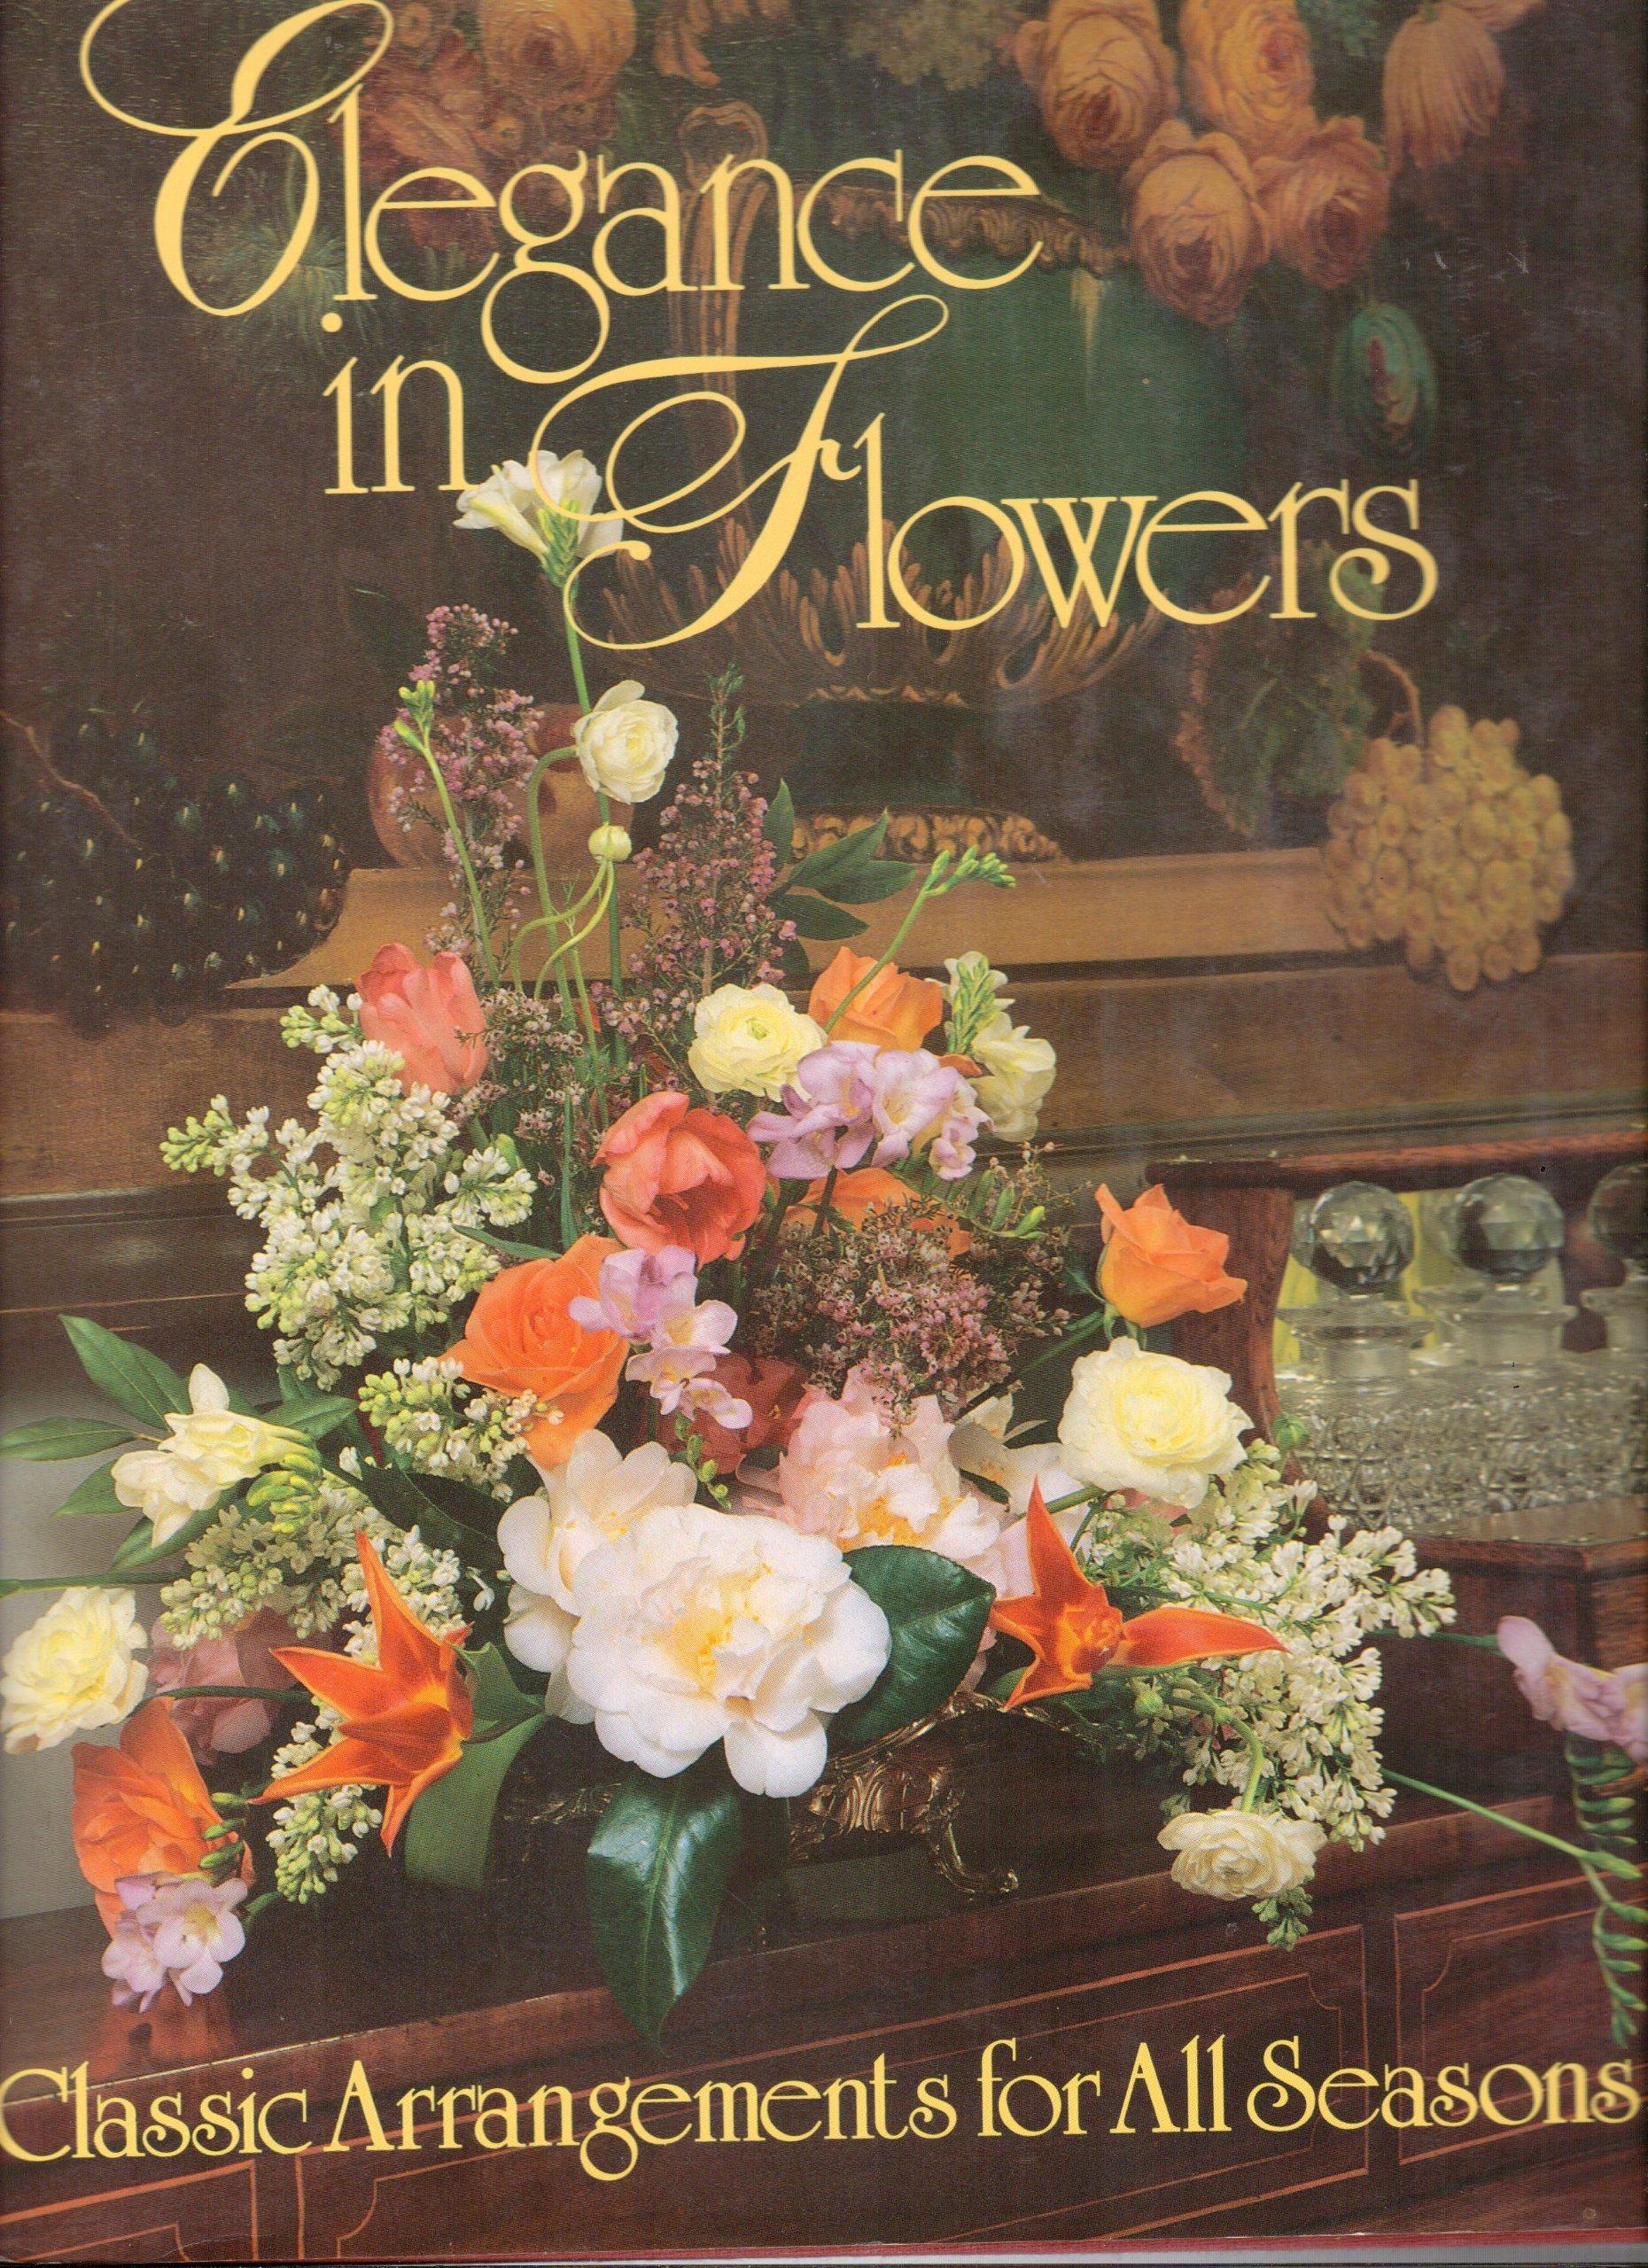 Elegance in Flowers: Classic Arrangements for All Seasons